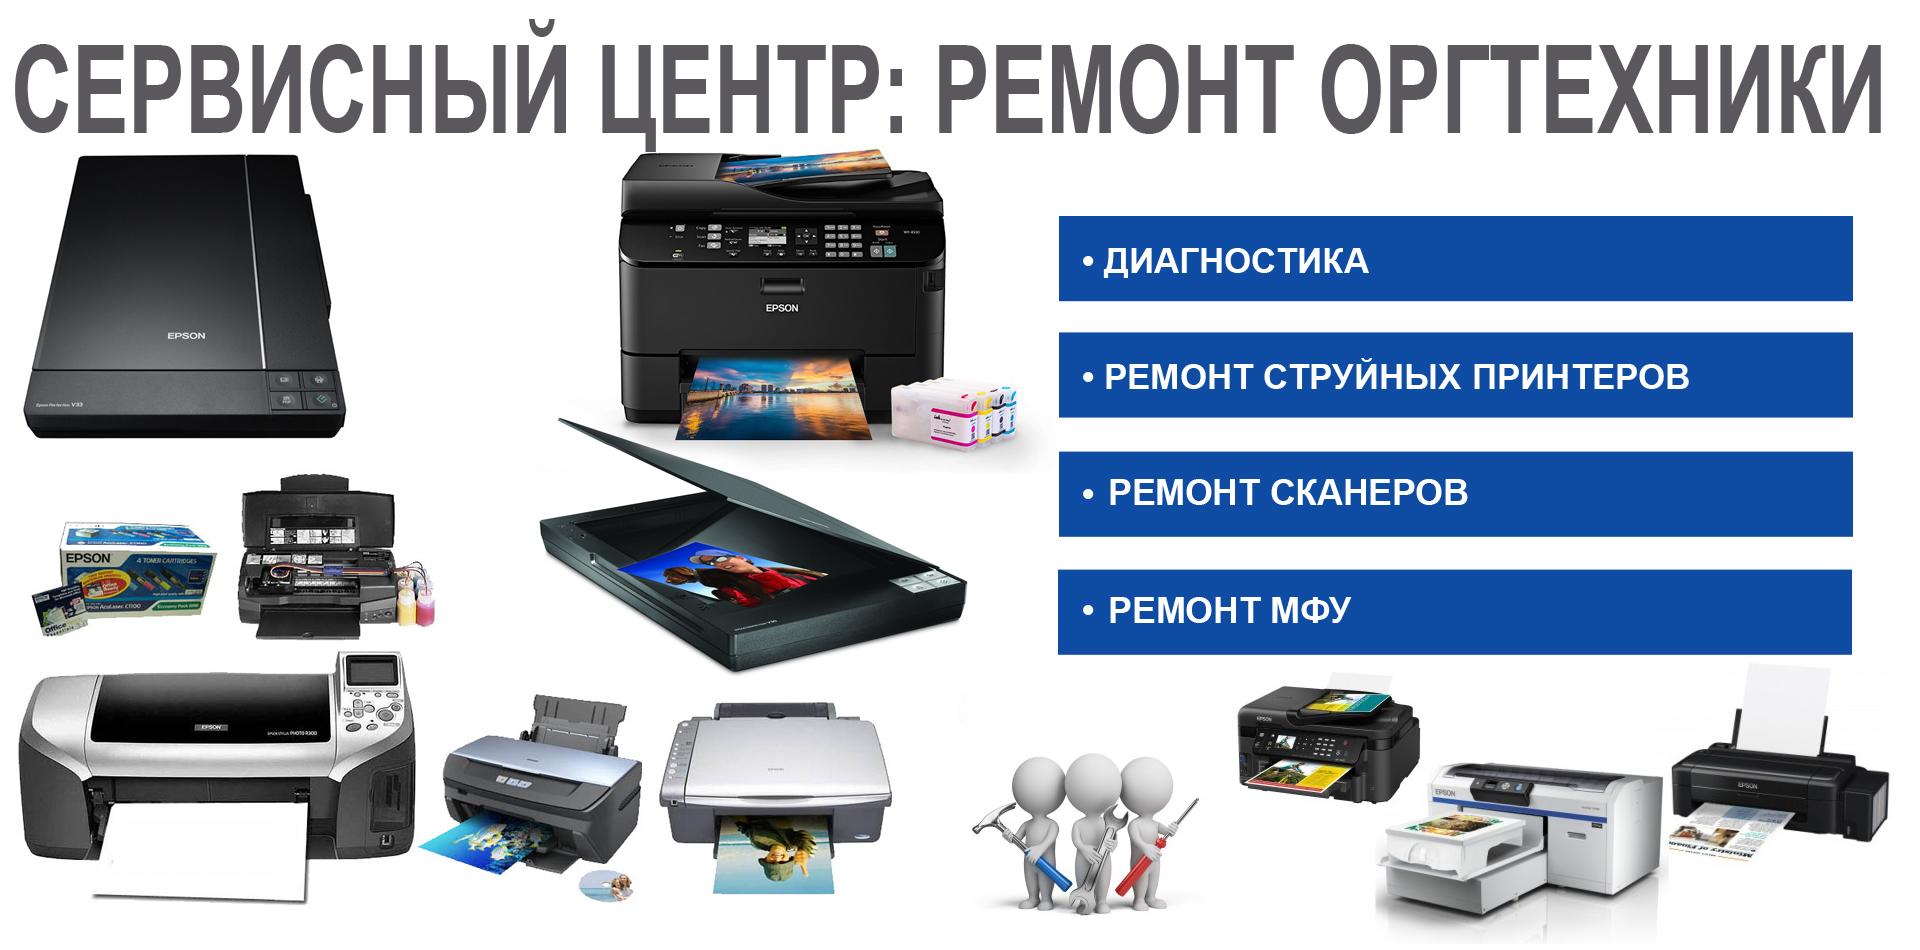 РЕМОНТ ОРГТЕХНИКИ В АСТАНЕ.